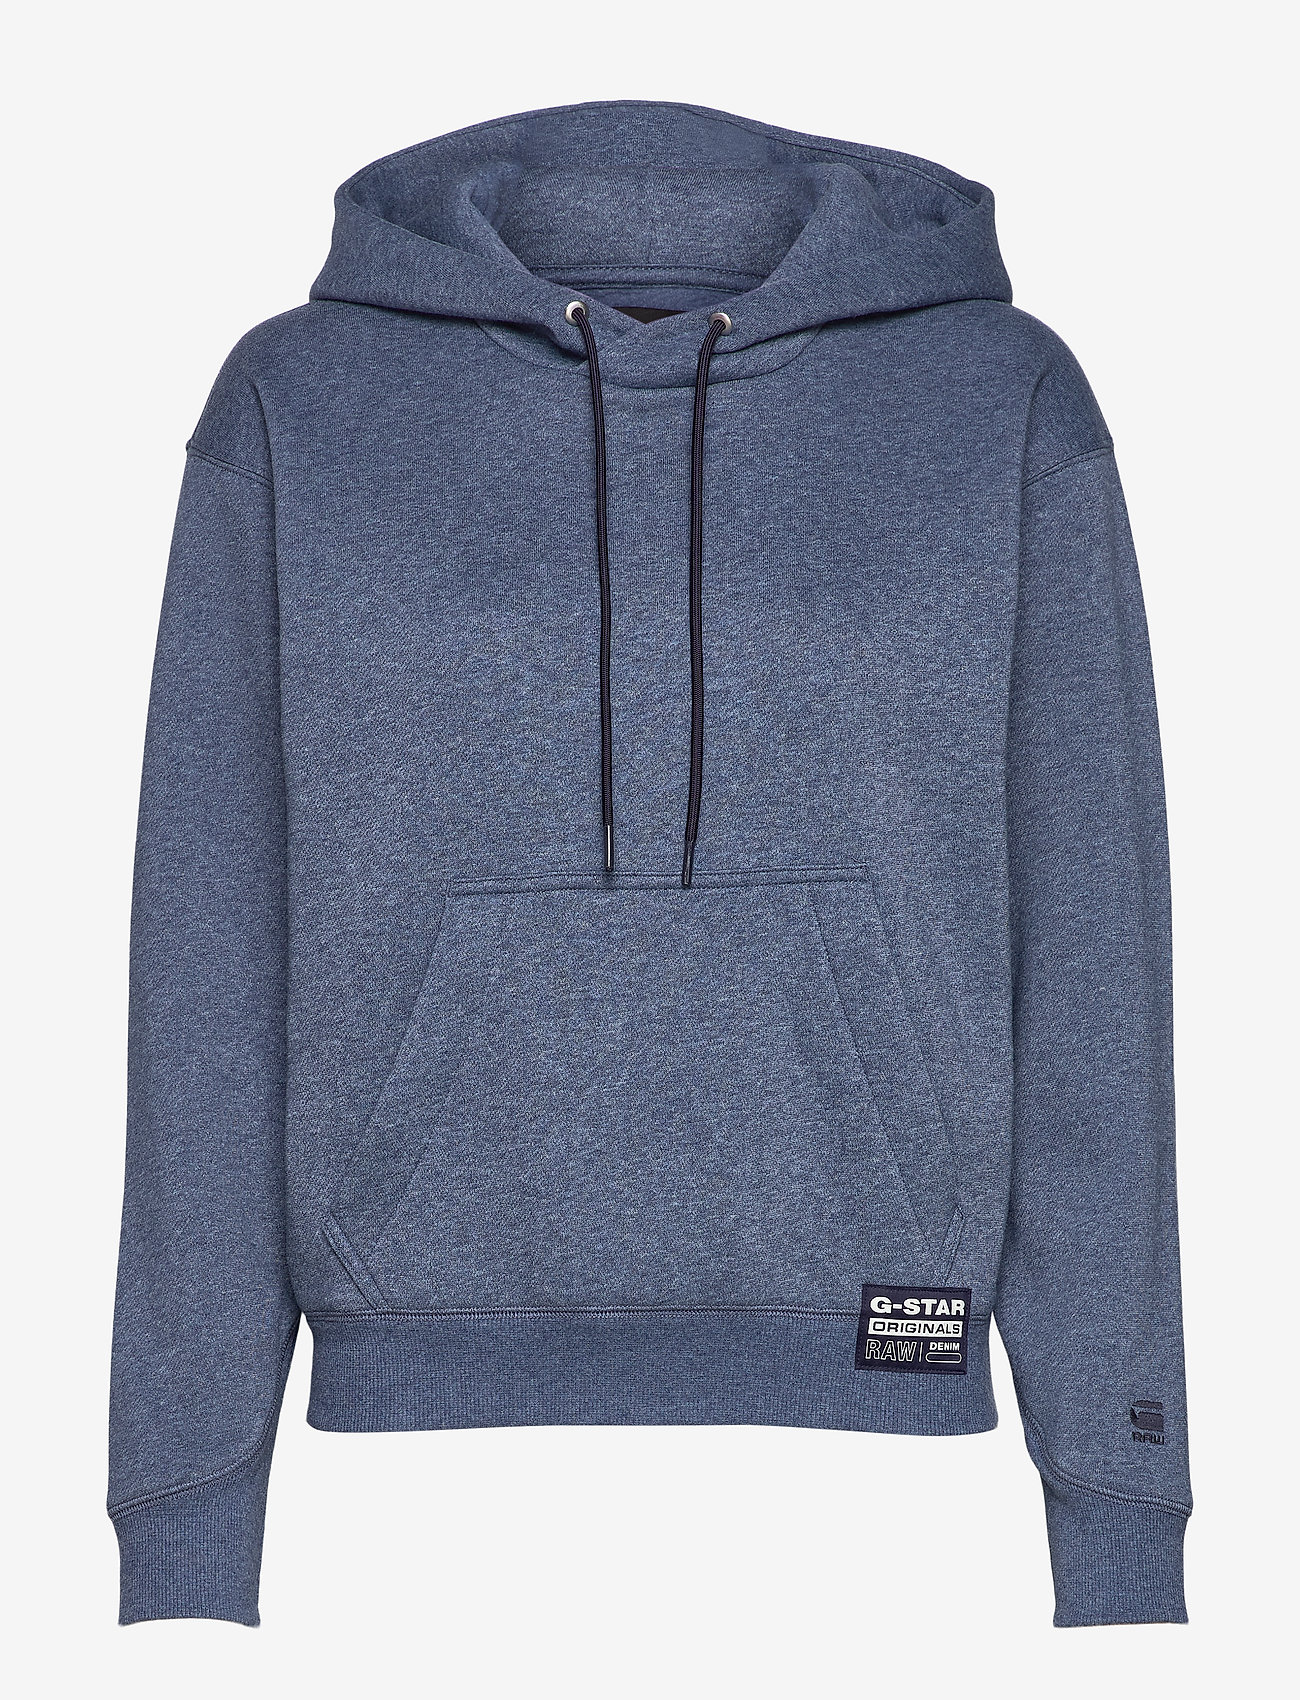 G-star RAW - Premium core hooded sw wmn l\s - hoodies - worn in kobalt htr - 0